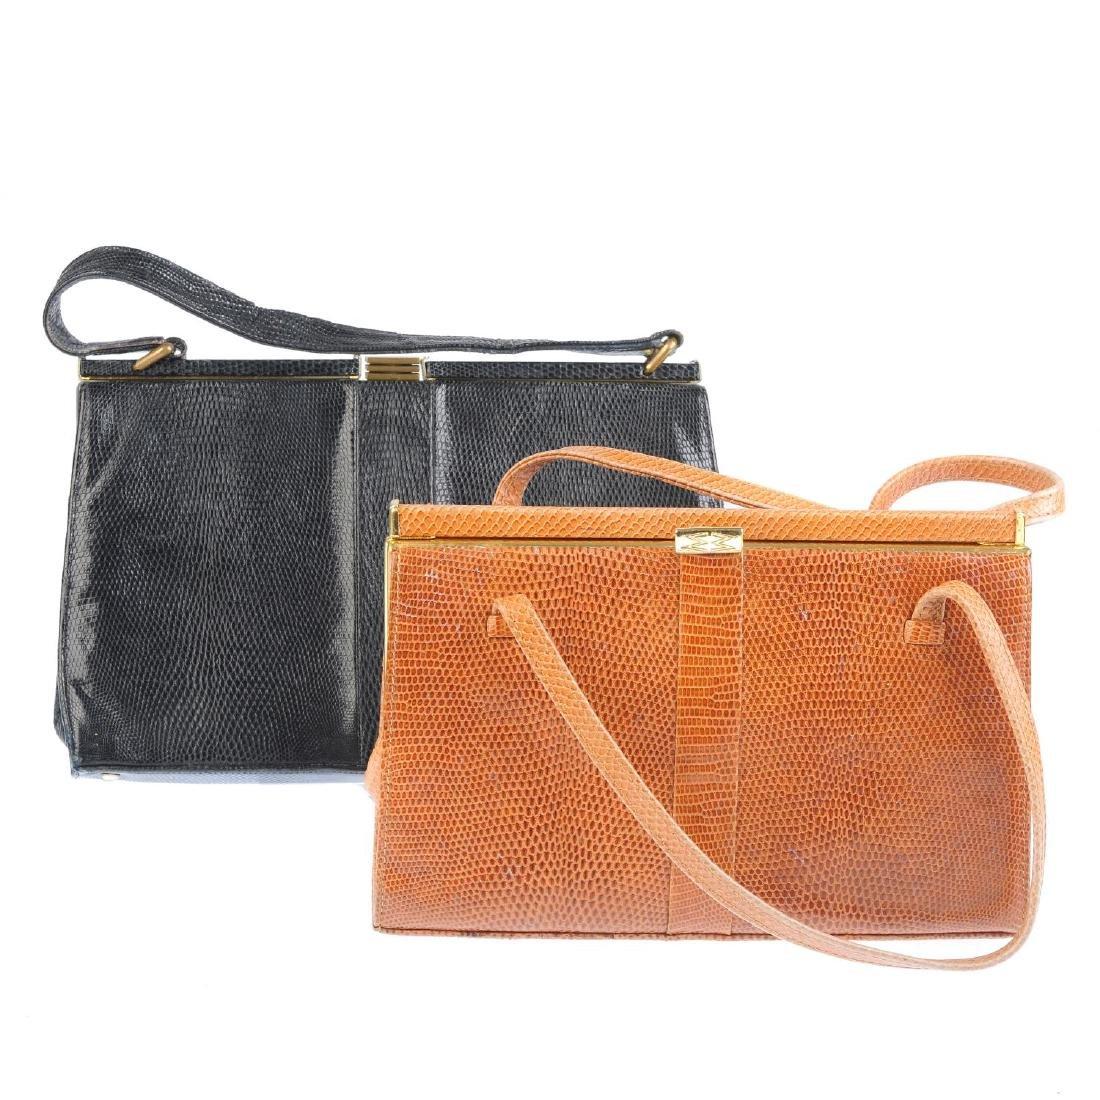 MAPPIN & WEBB - two vintage handbags. Both of a similar